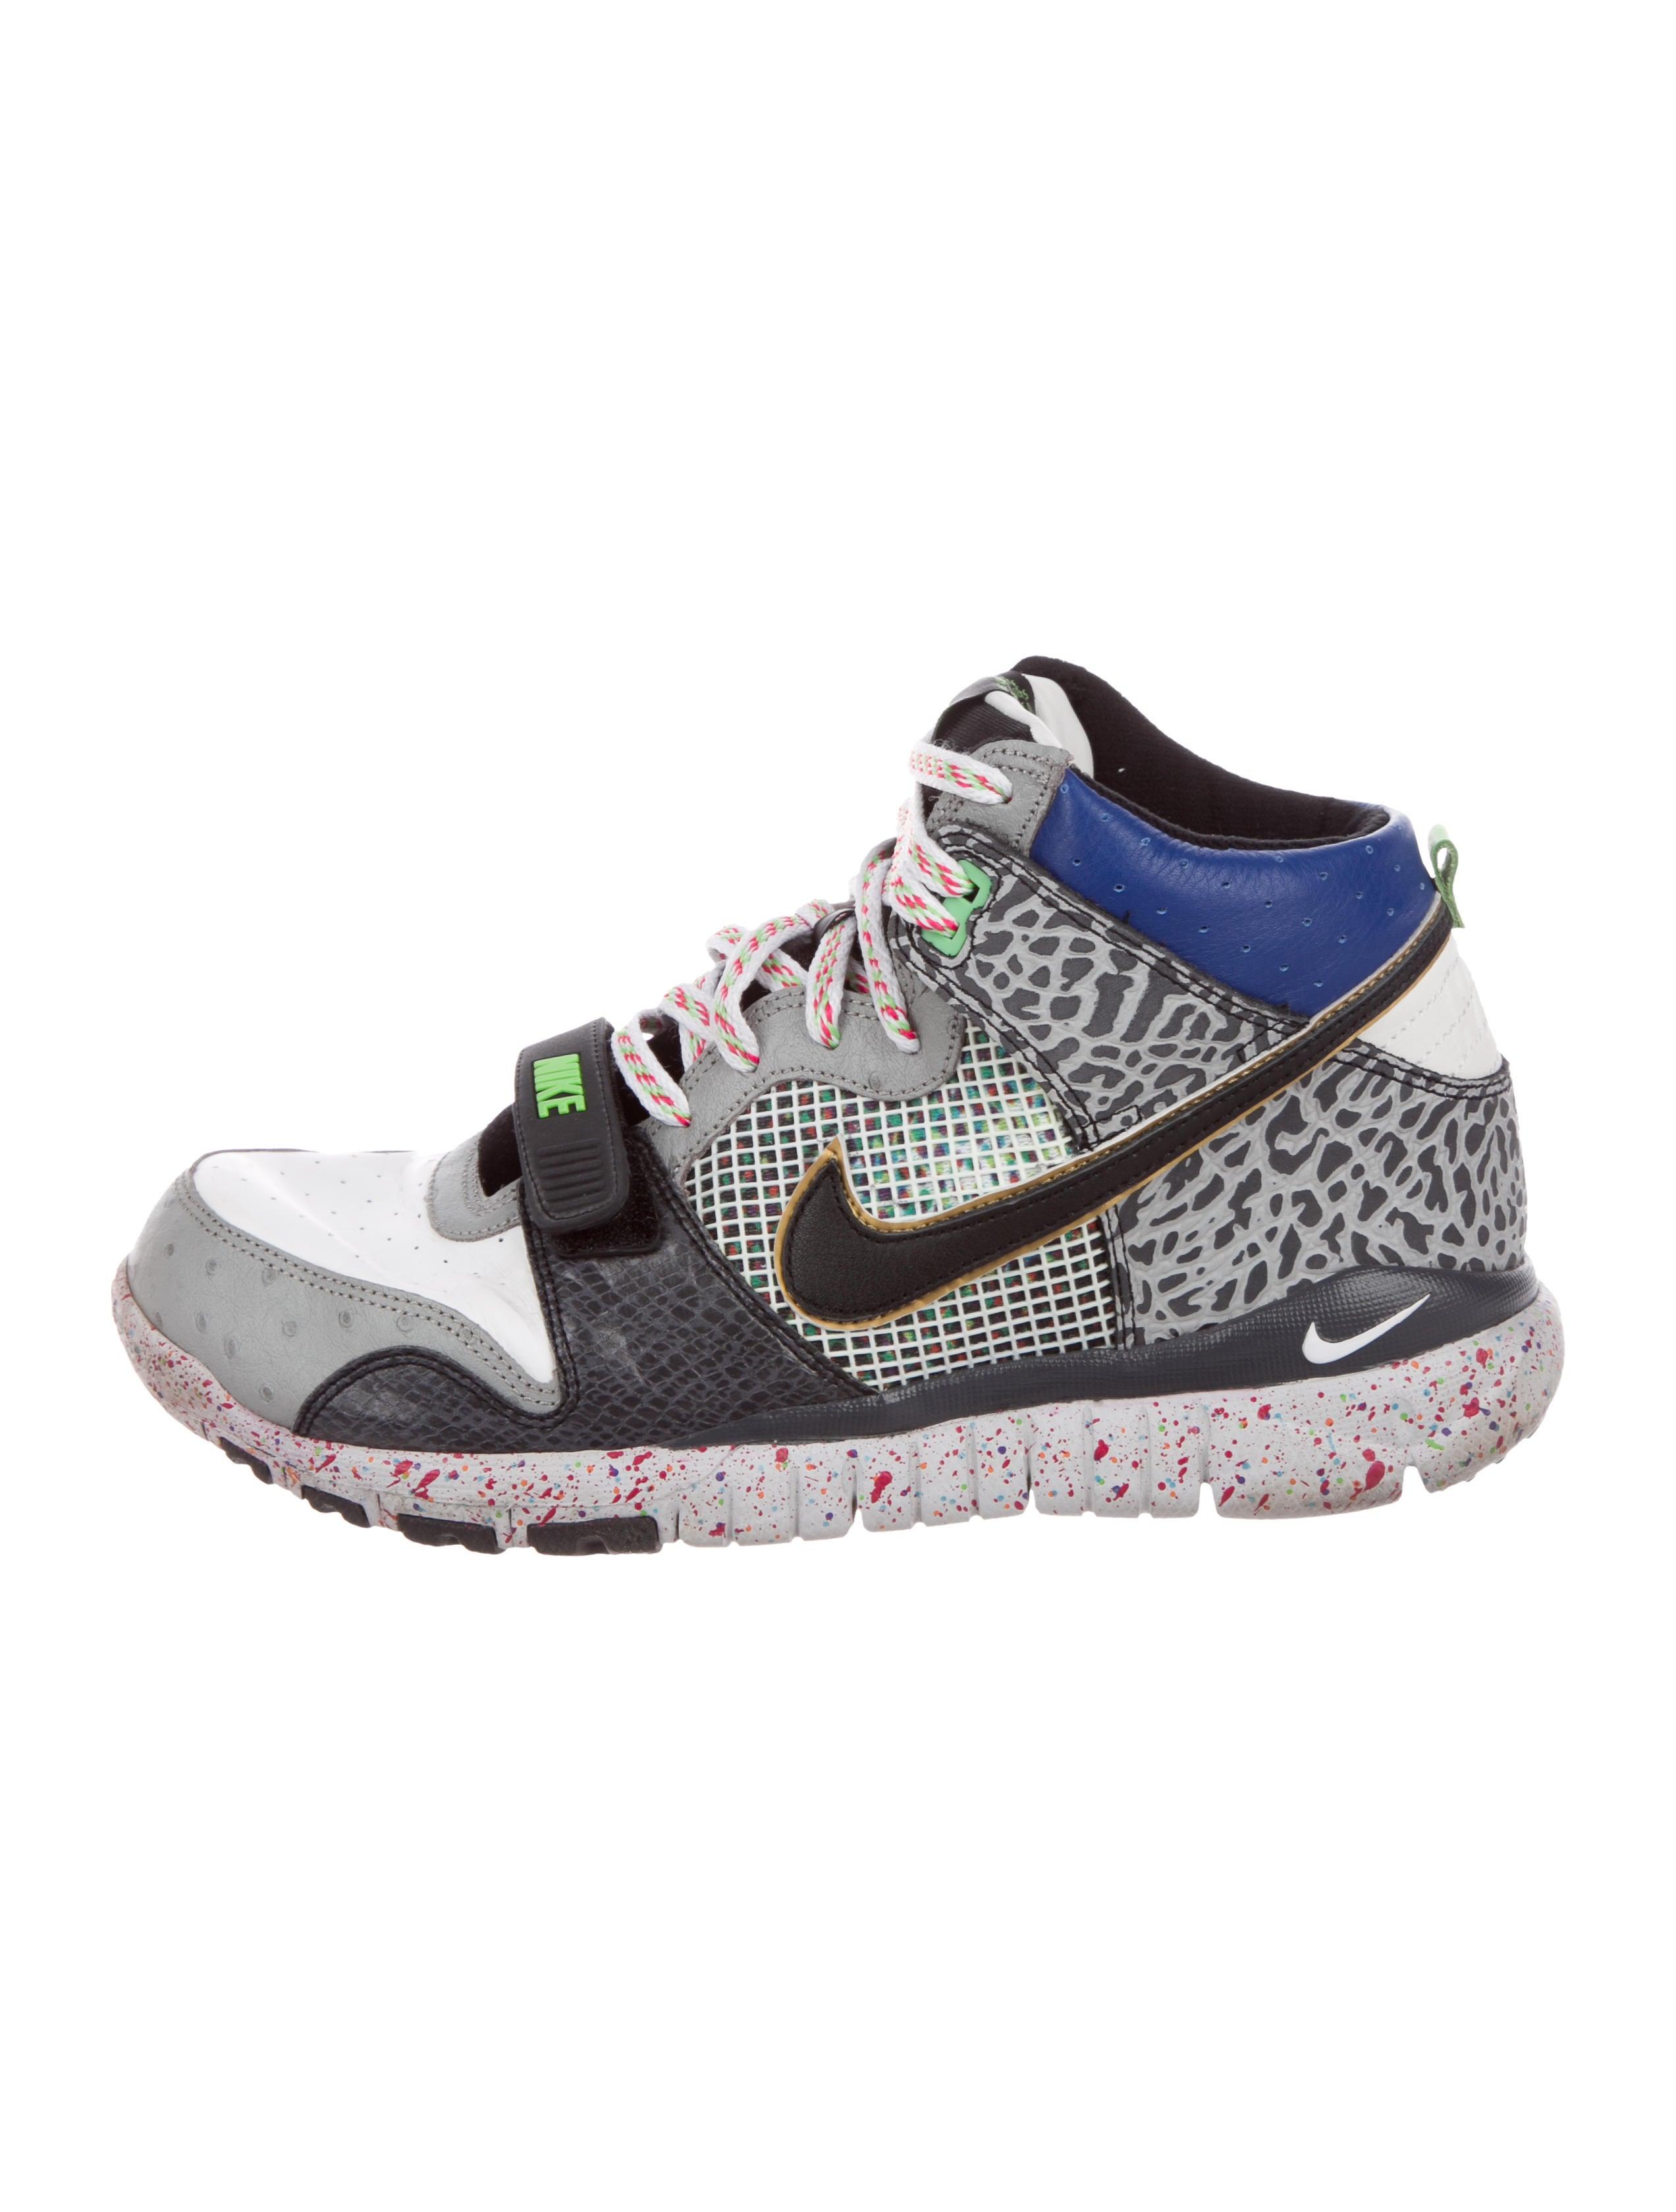 more photos 966b8 d9947 Nike x Mita Shinrabansho Trainer Dunk High Sneakers - Shoes ...